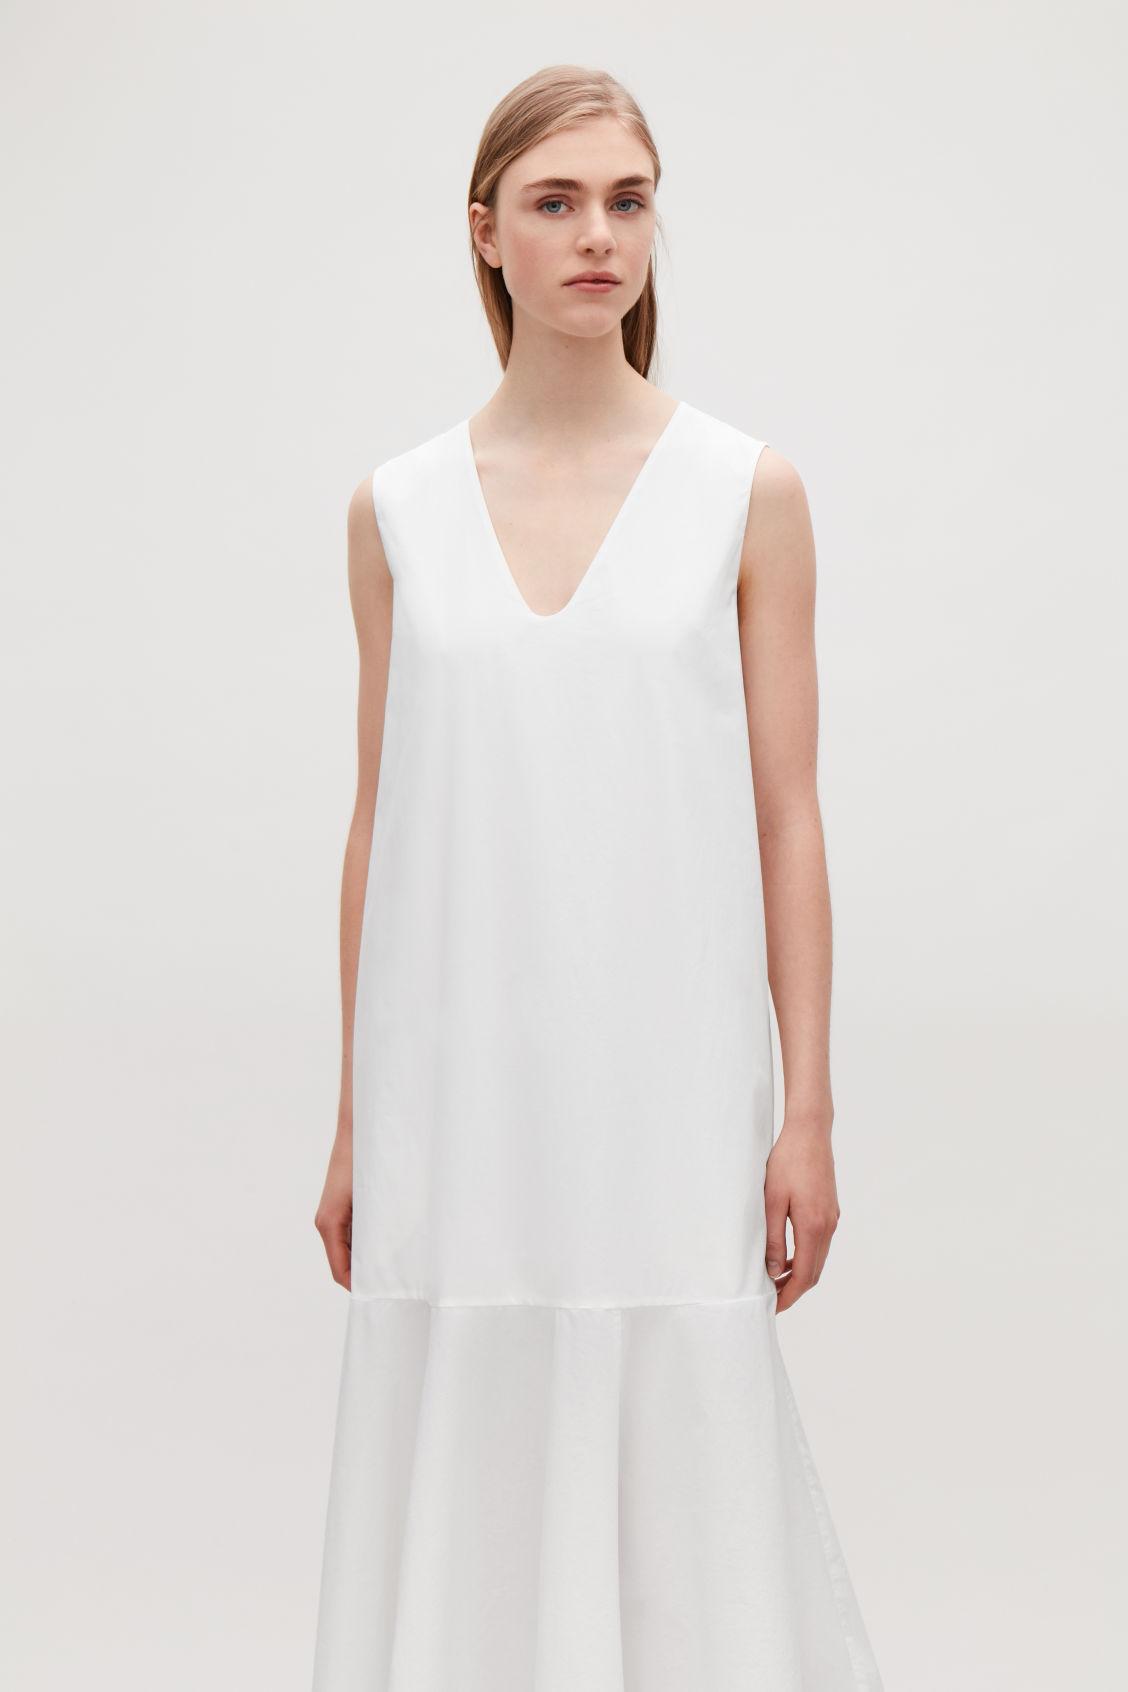 COTTON POPLIN SLEEVELESS DRESS - White - Dresses - COS